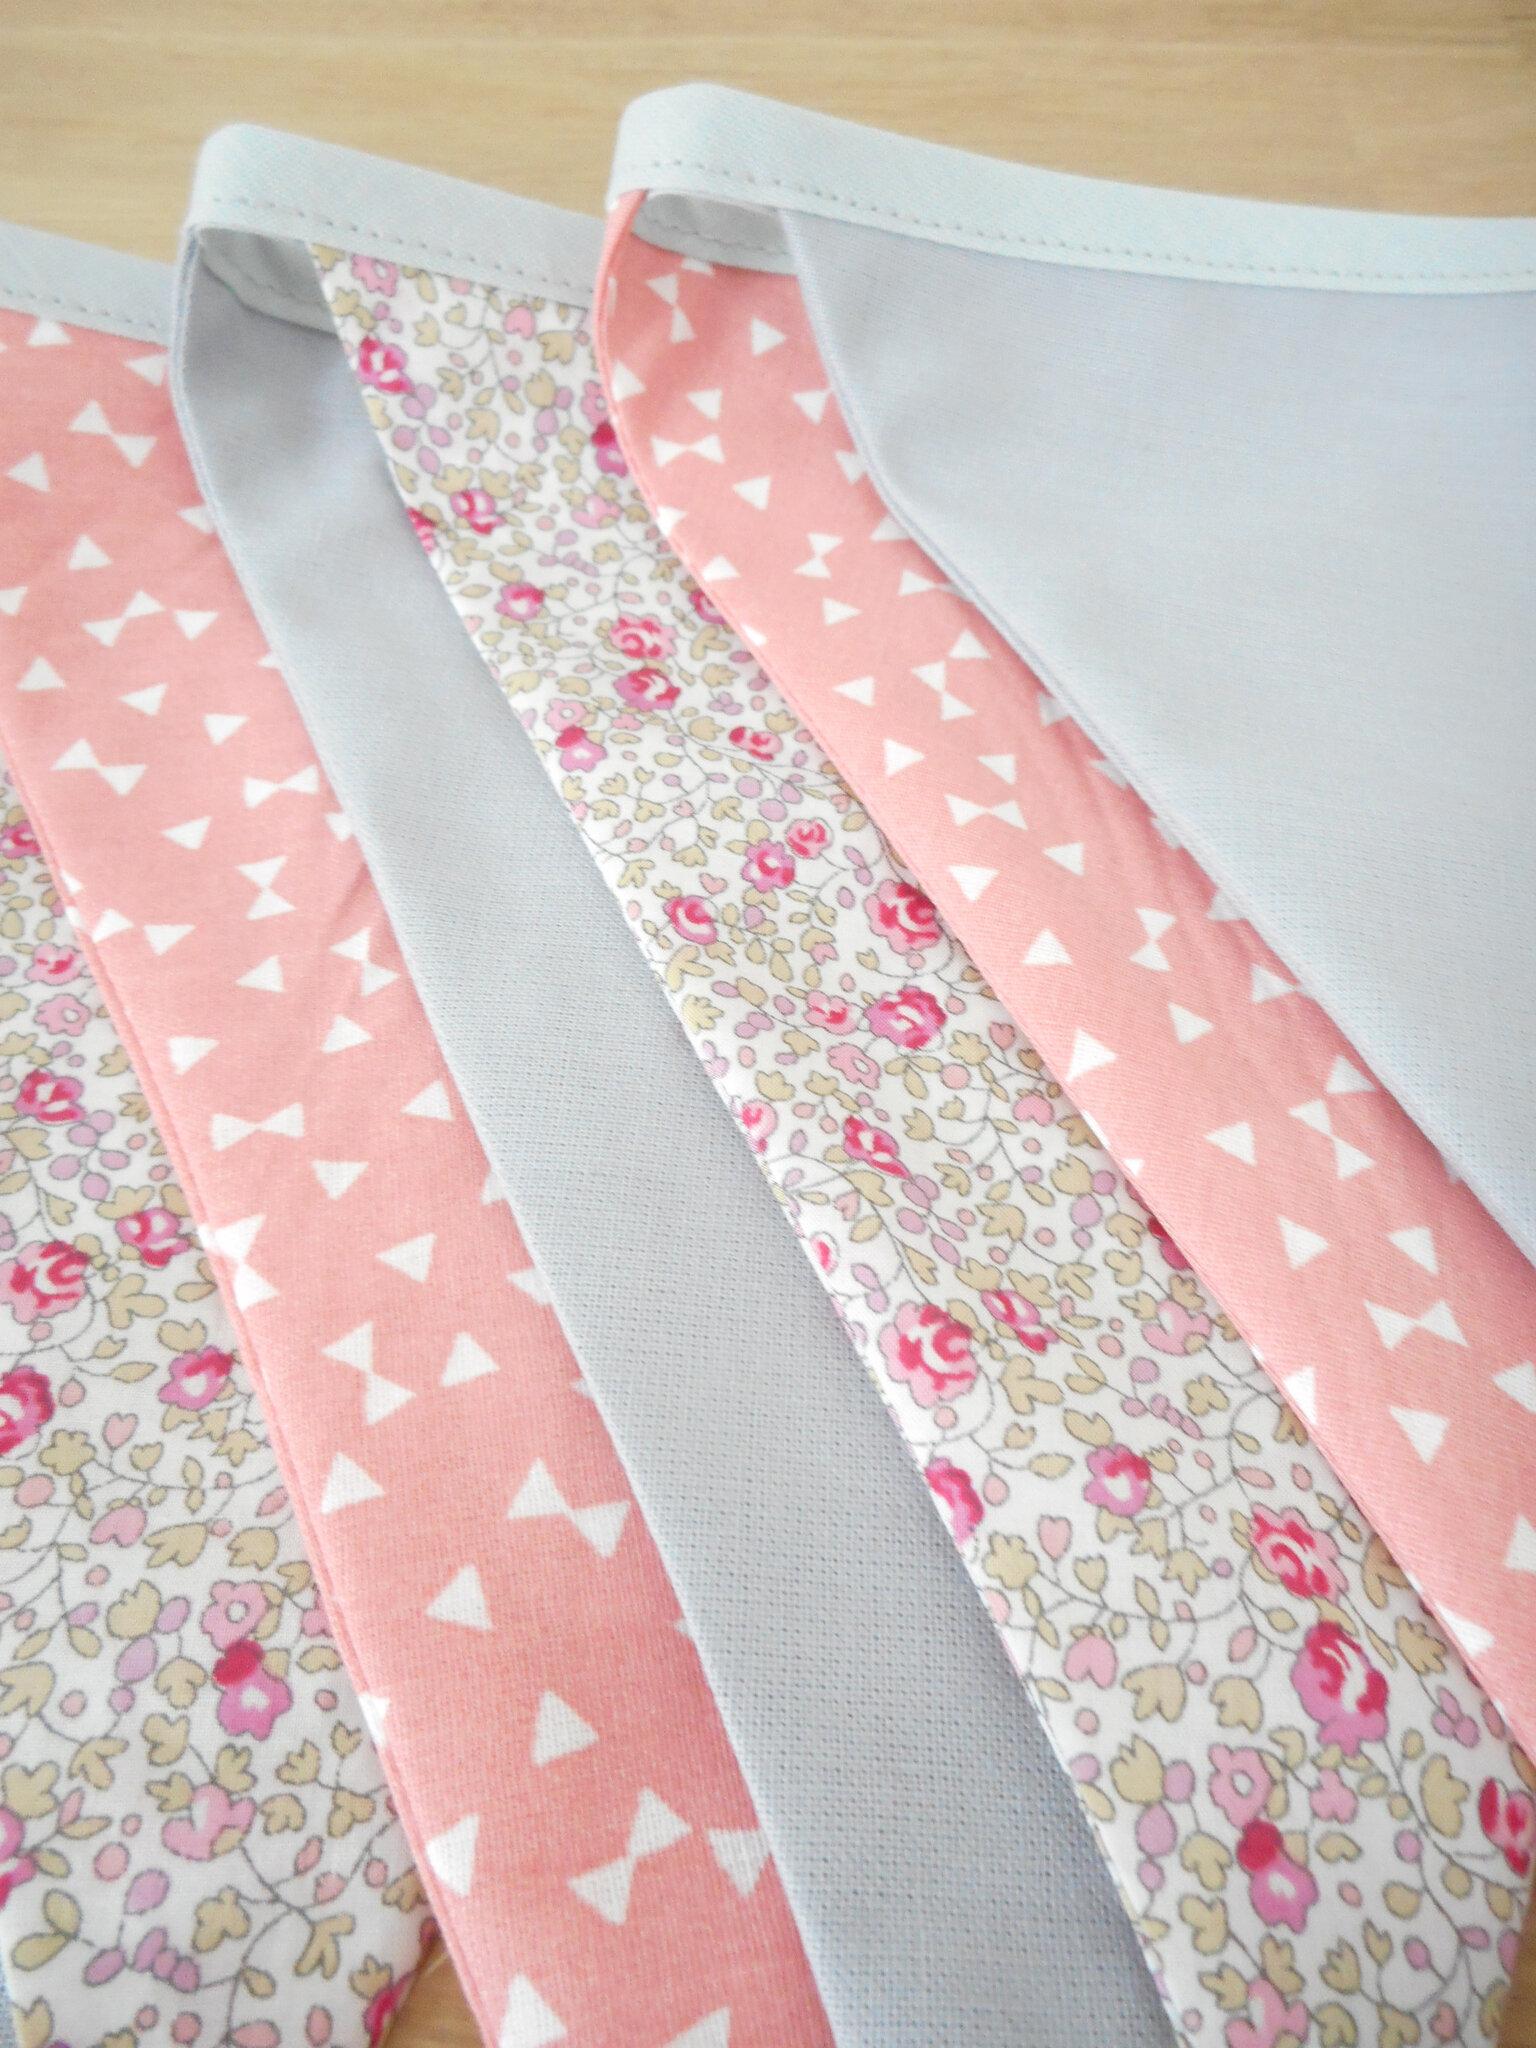 guirlande de 7 fanions tissu uni gris tissu liberty elo se rose imprim fleurs tissu rose. Black Bedroom Furniture Sets. Home Design Ideas